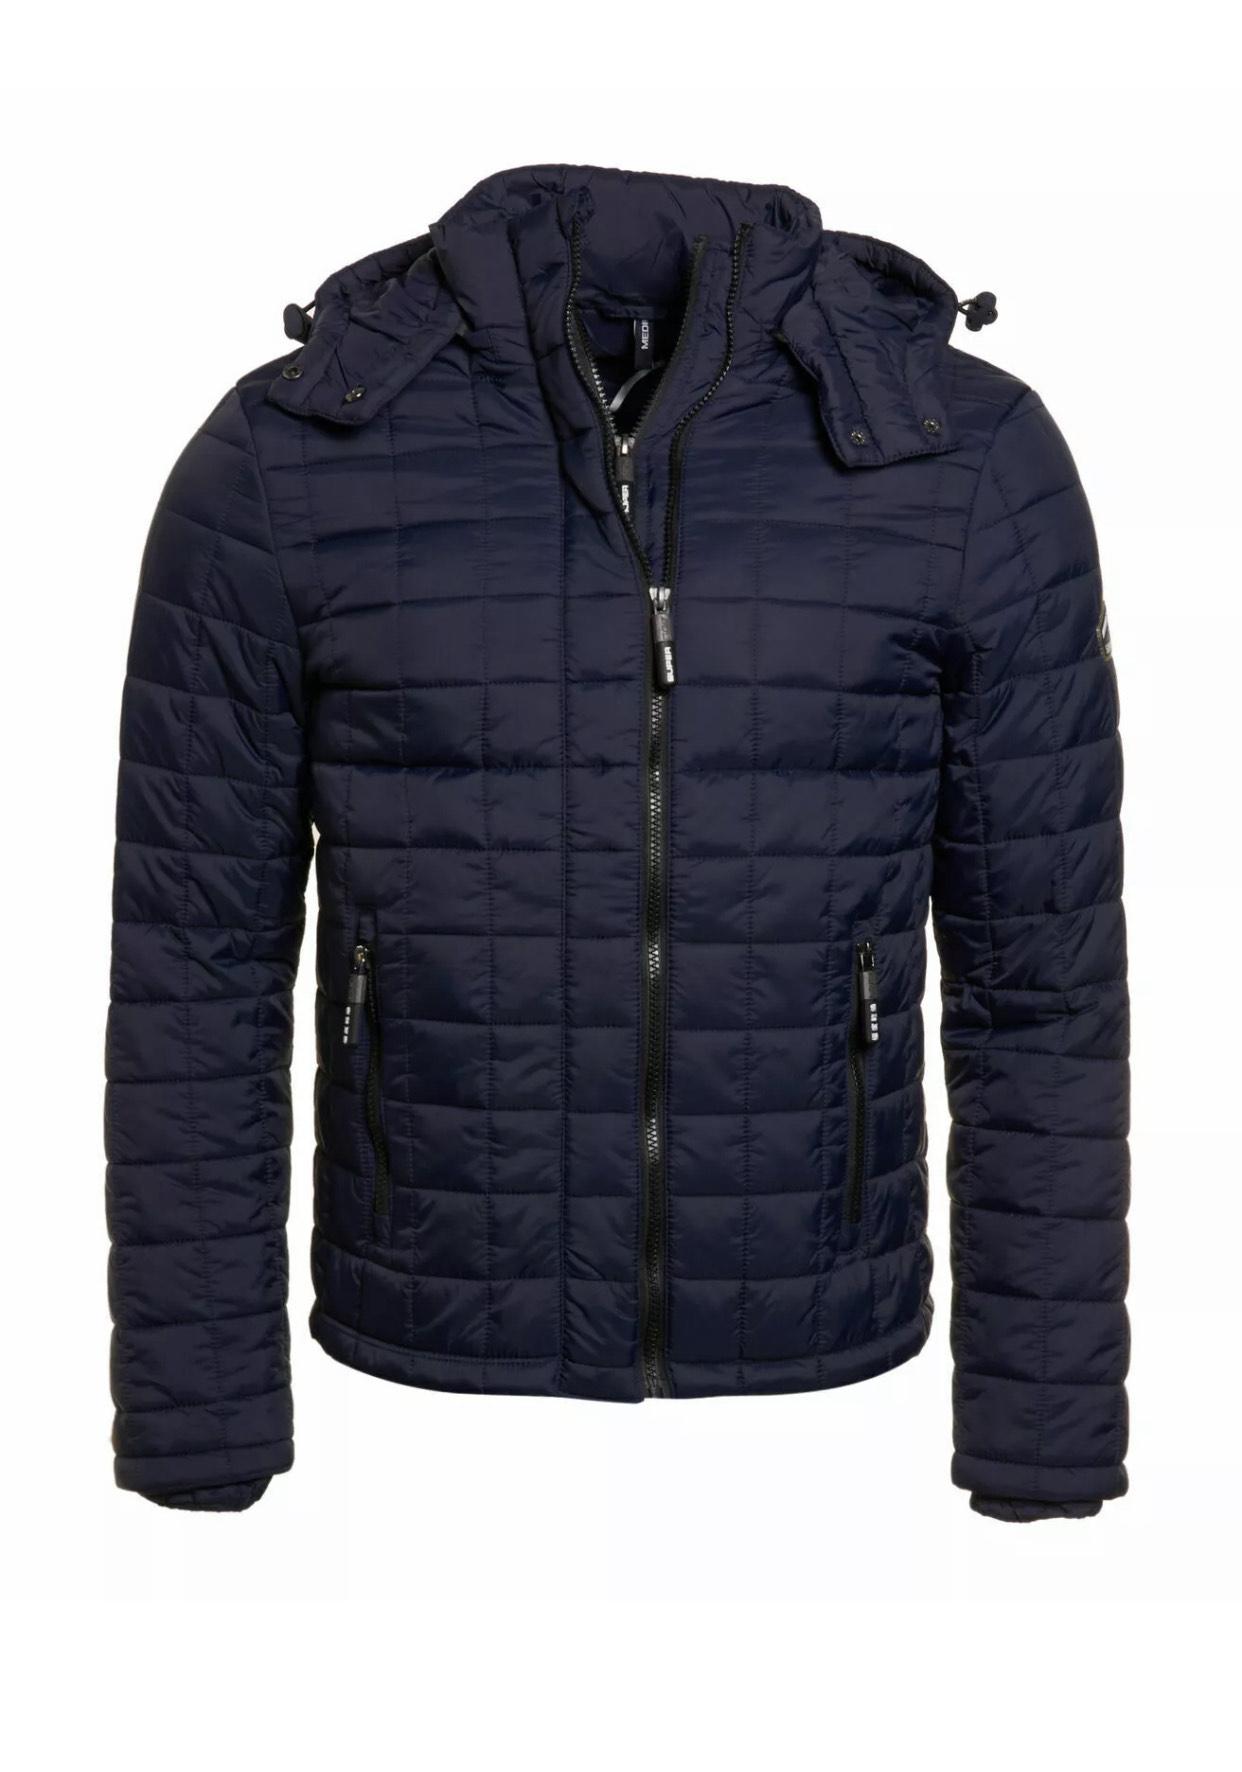 New Mens Superdry Box Quilt Fuji Hooded Jacket £34.19 Superdry on eBay